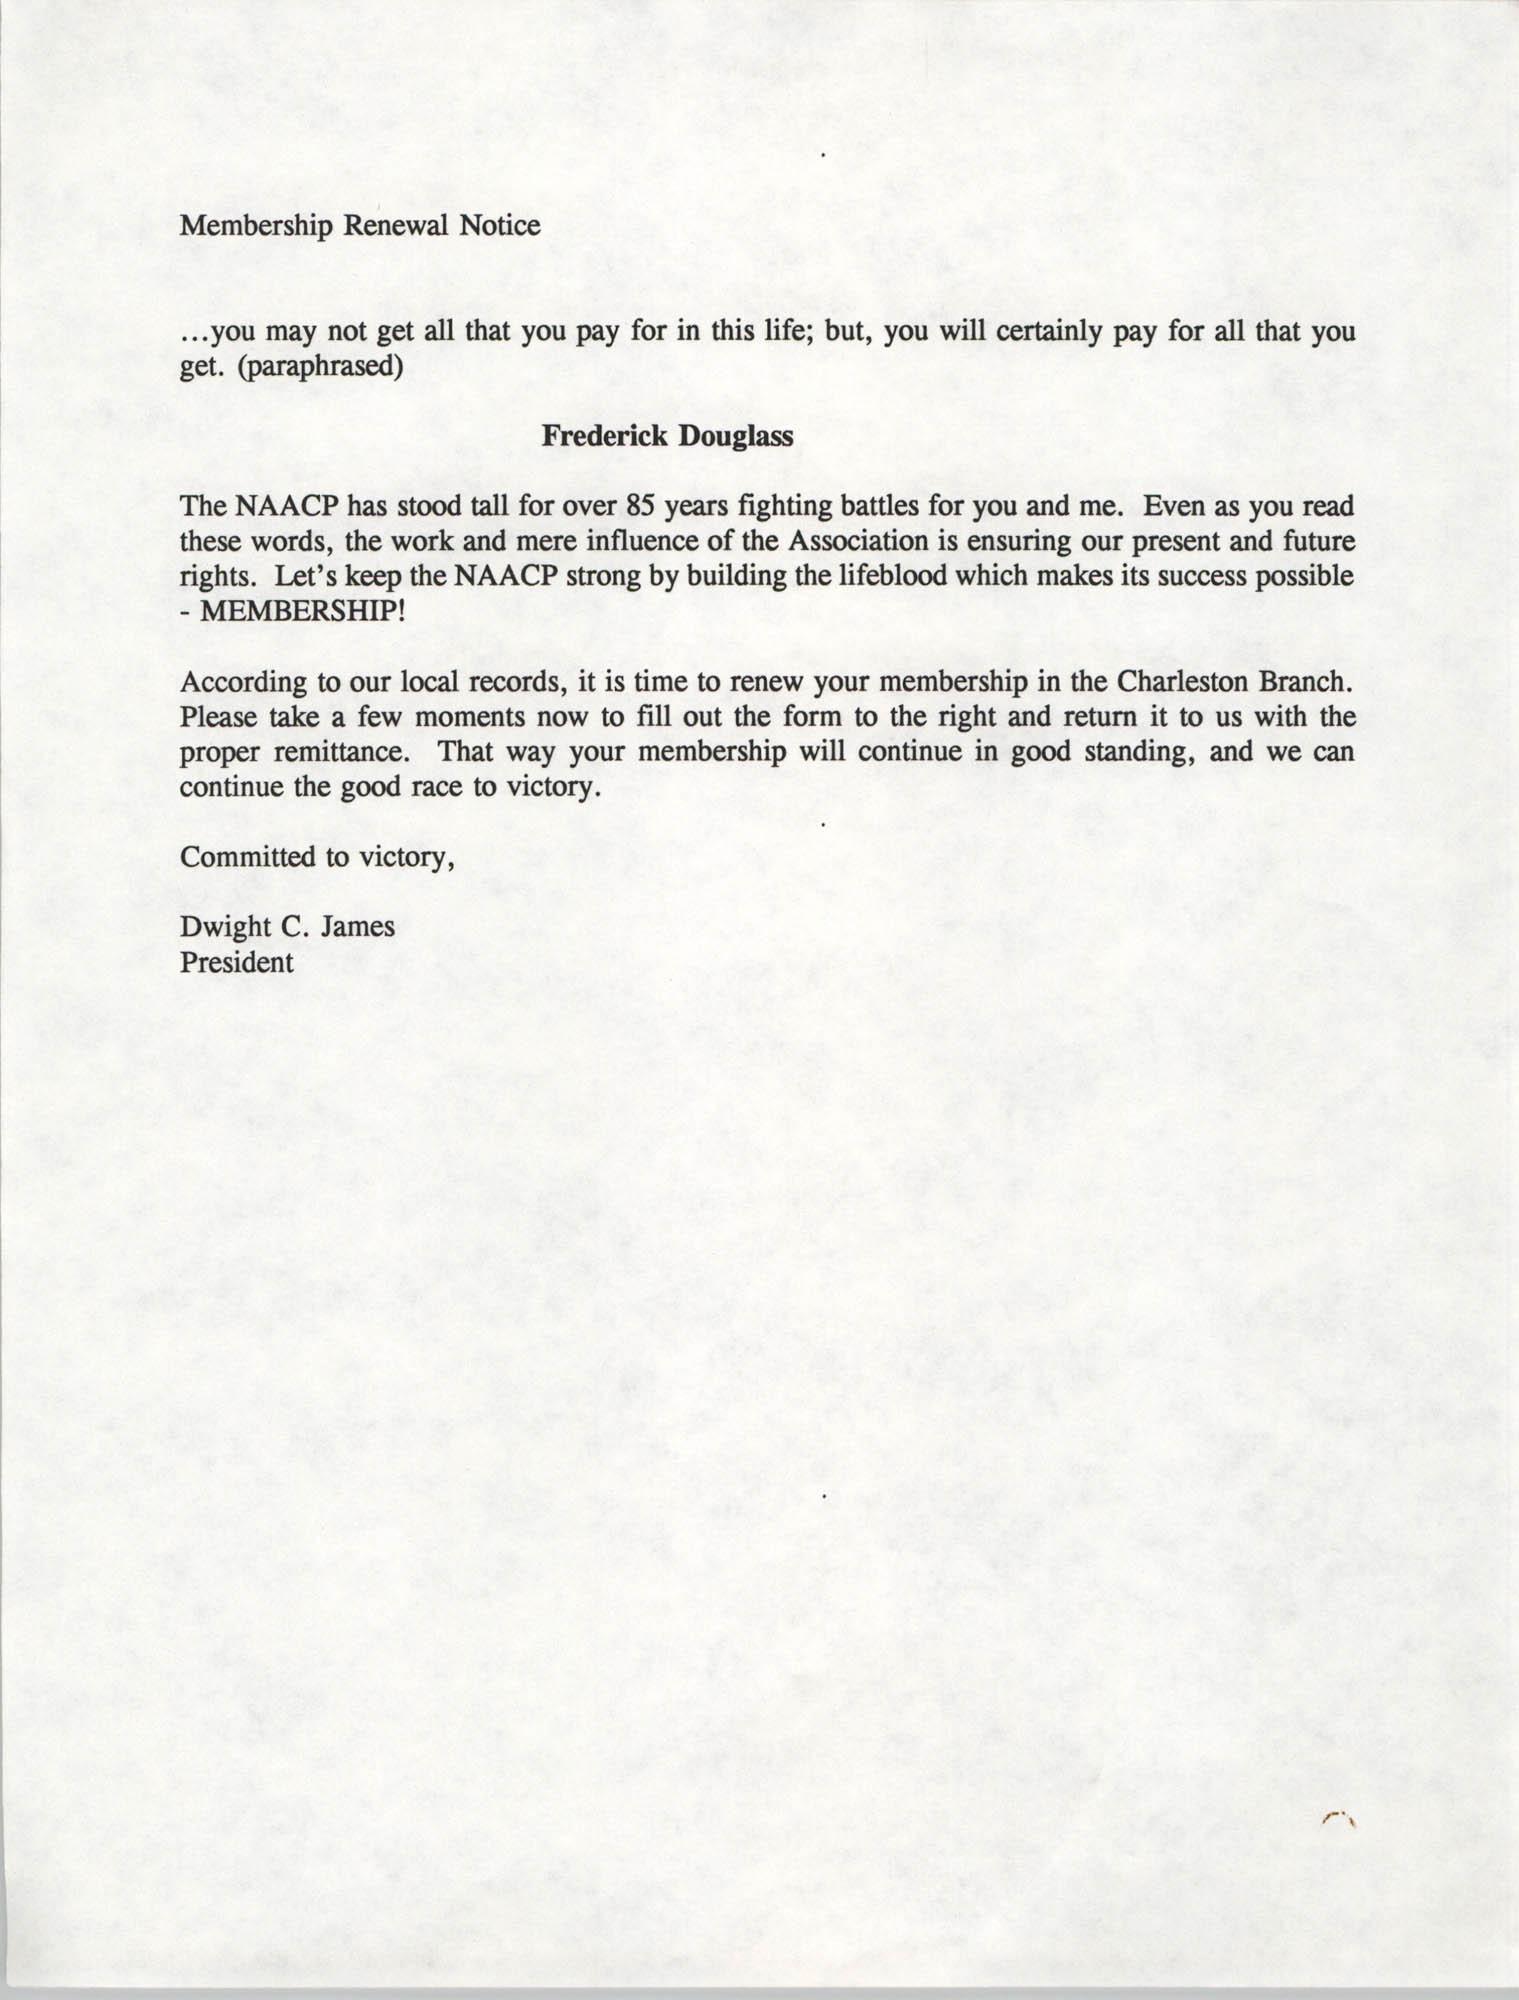 Membership Renewal Notice, Charleston Branch of the NAACP, Dwight C. James